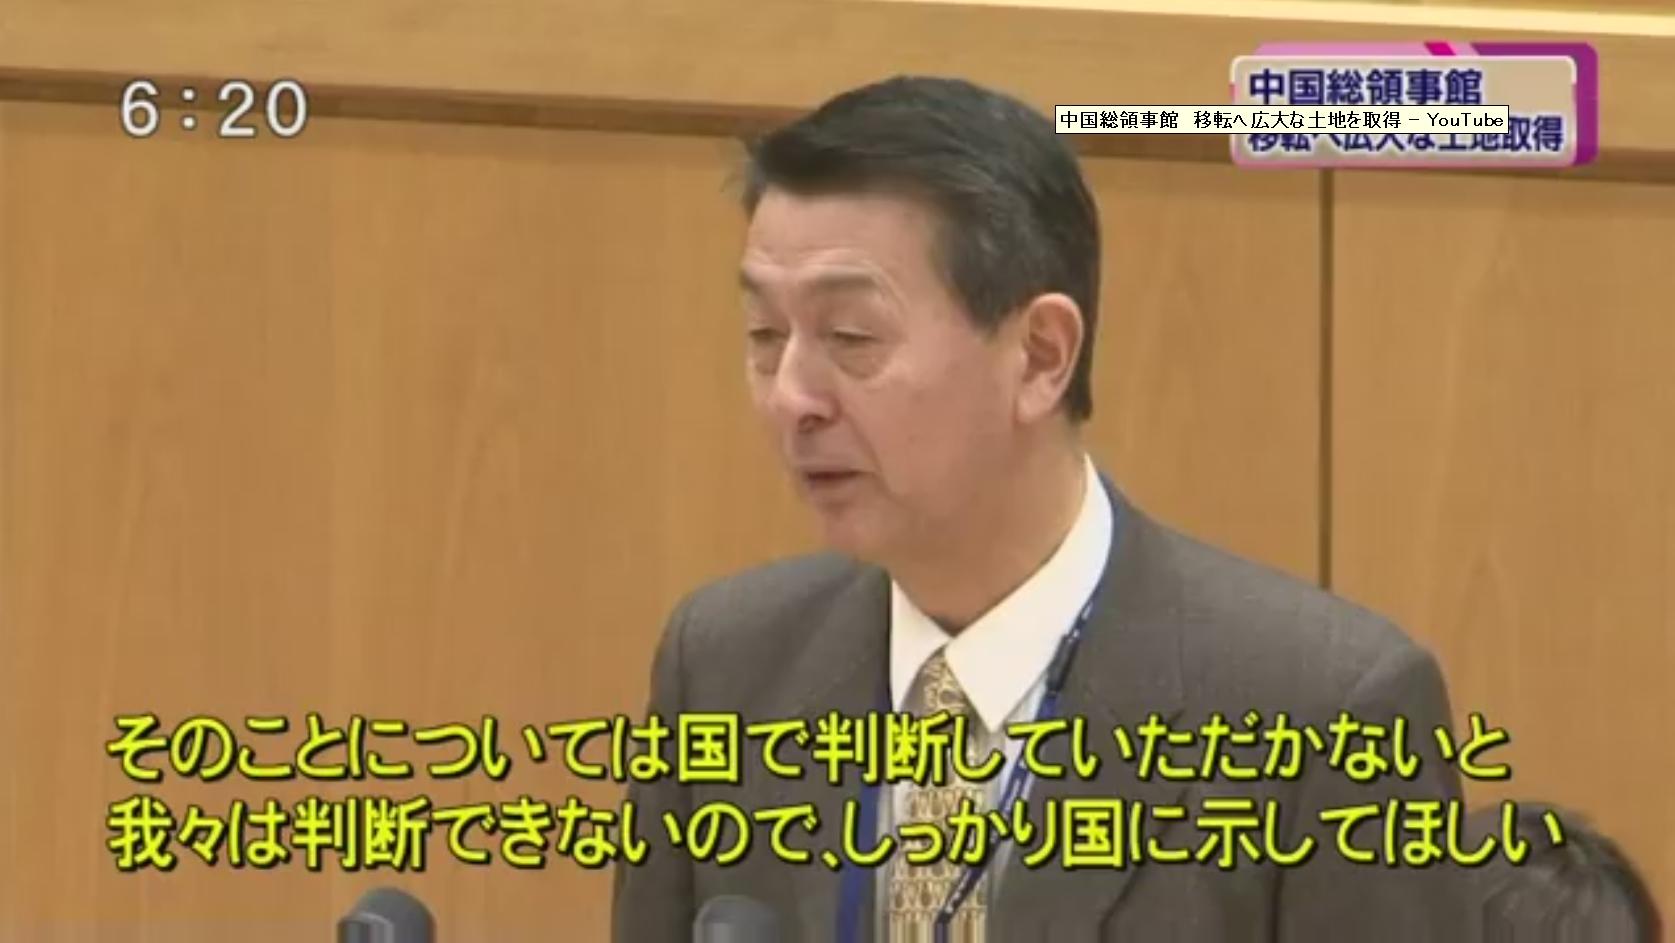 nigata_ryojikan_tv3.jpg